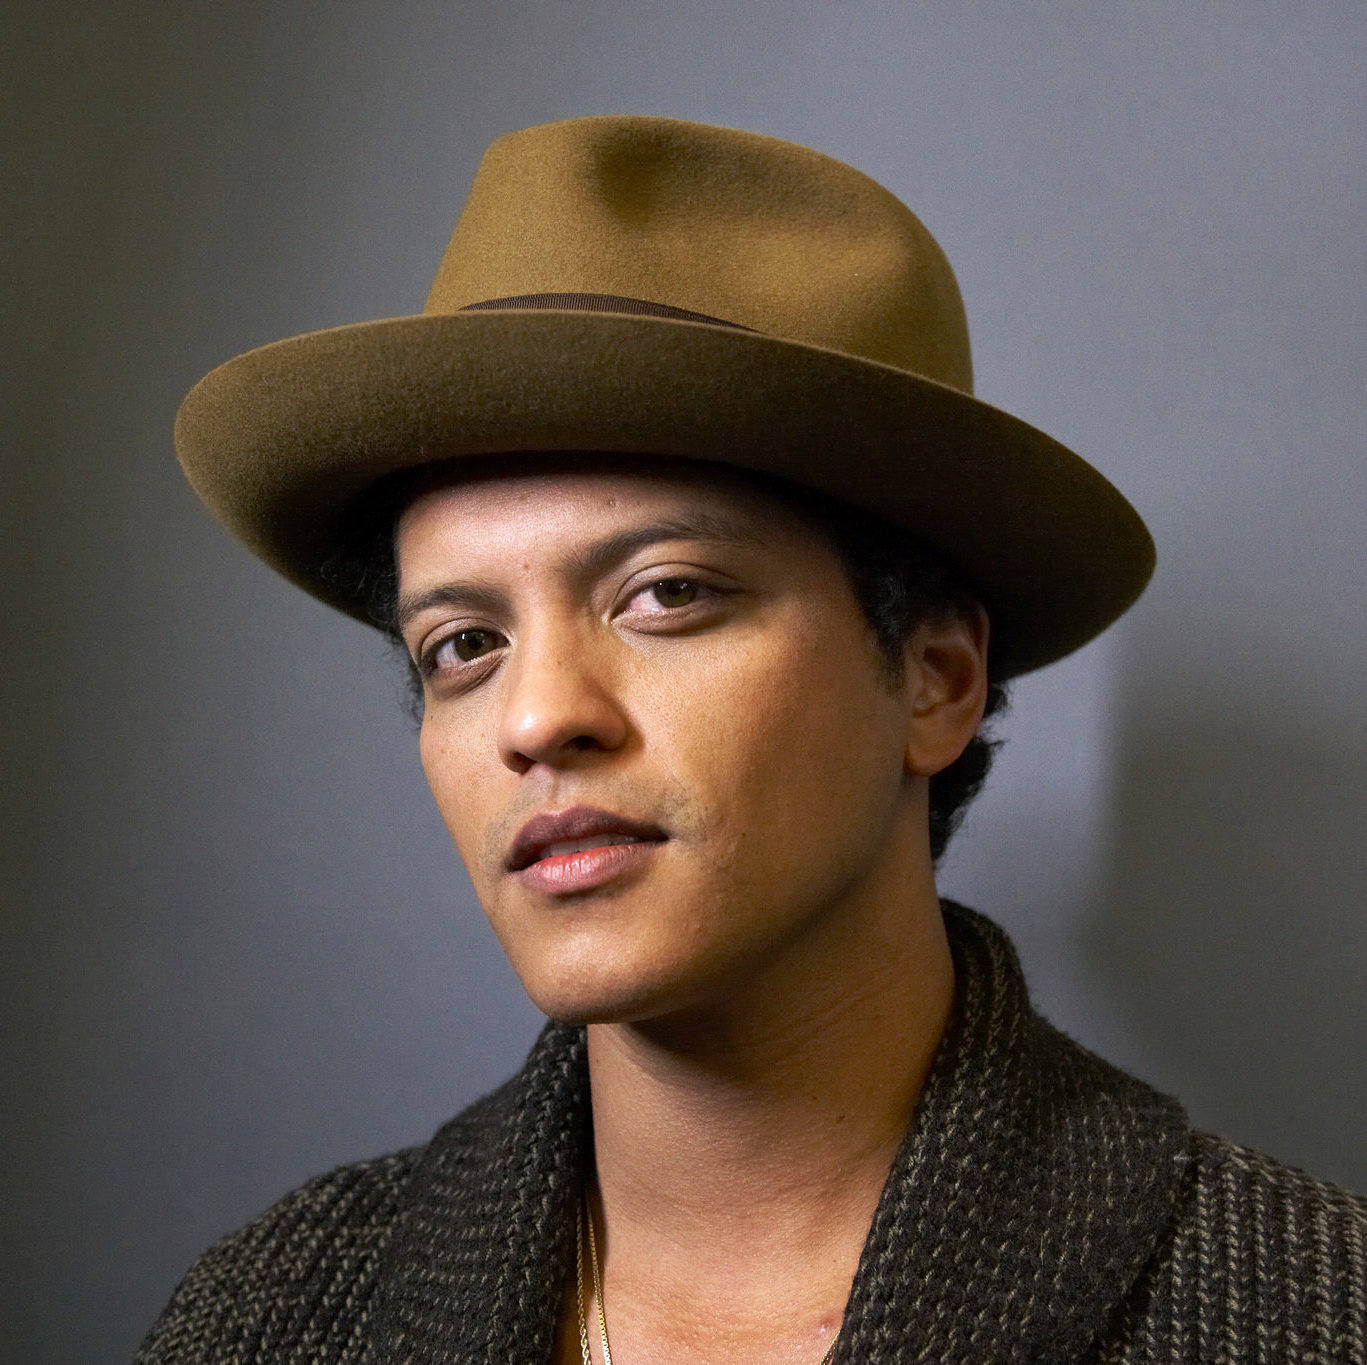 Bruno Mars Live in Las Vegas 2019